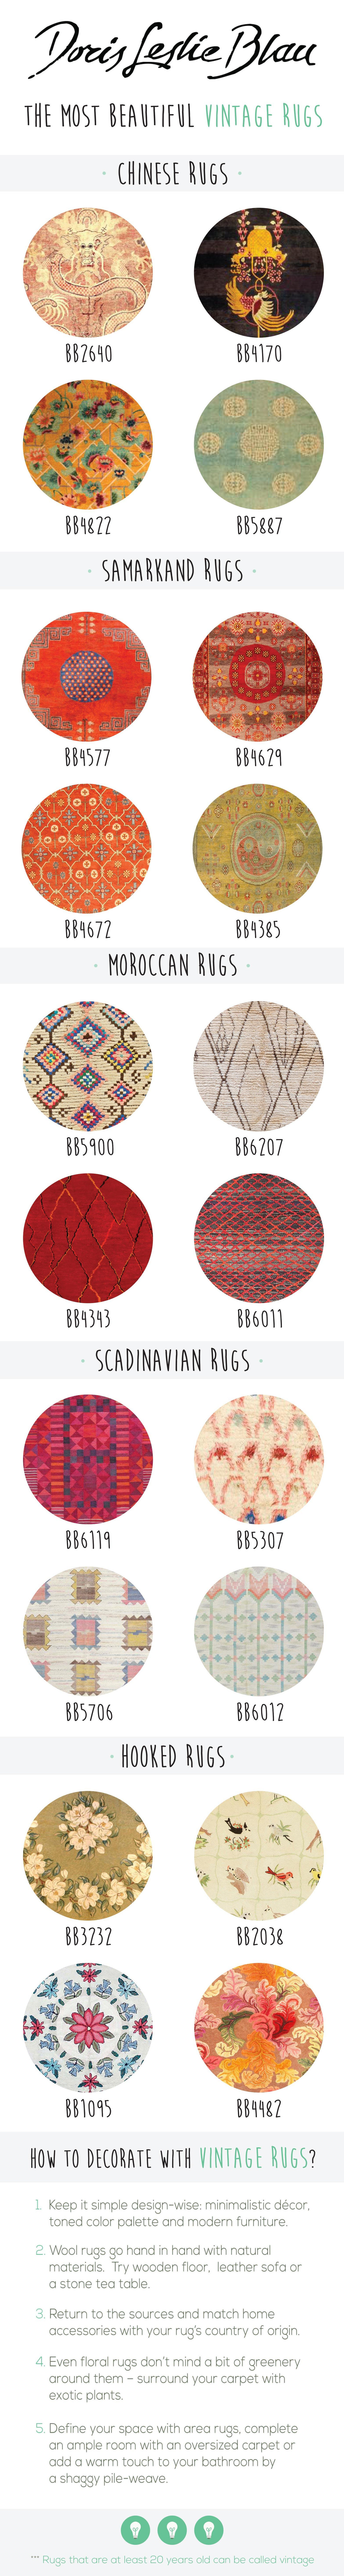 vintage rugs interior decor moroccan rug chinese rug scandinavian rug